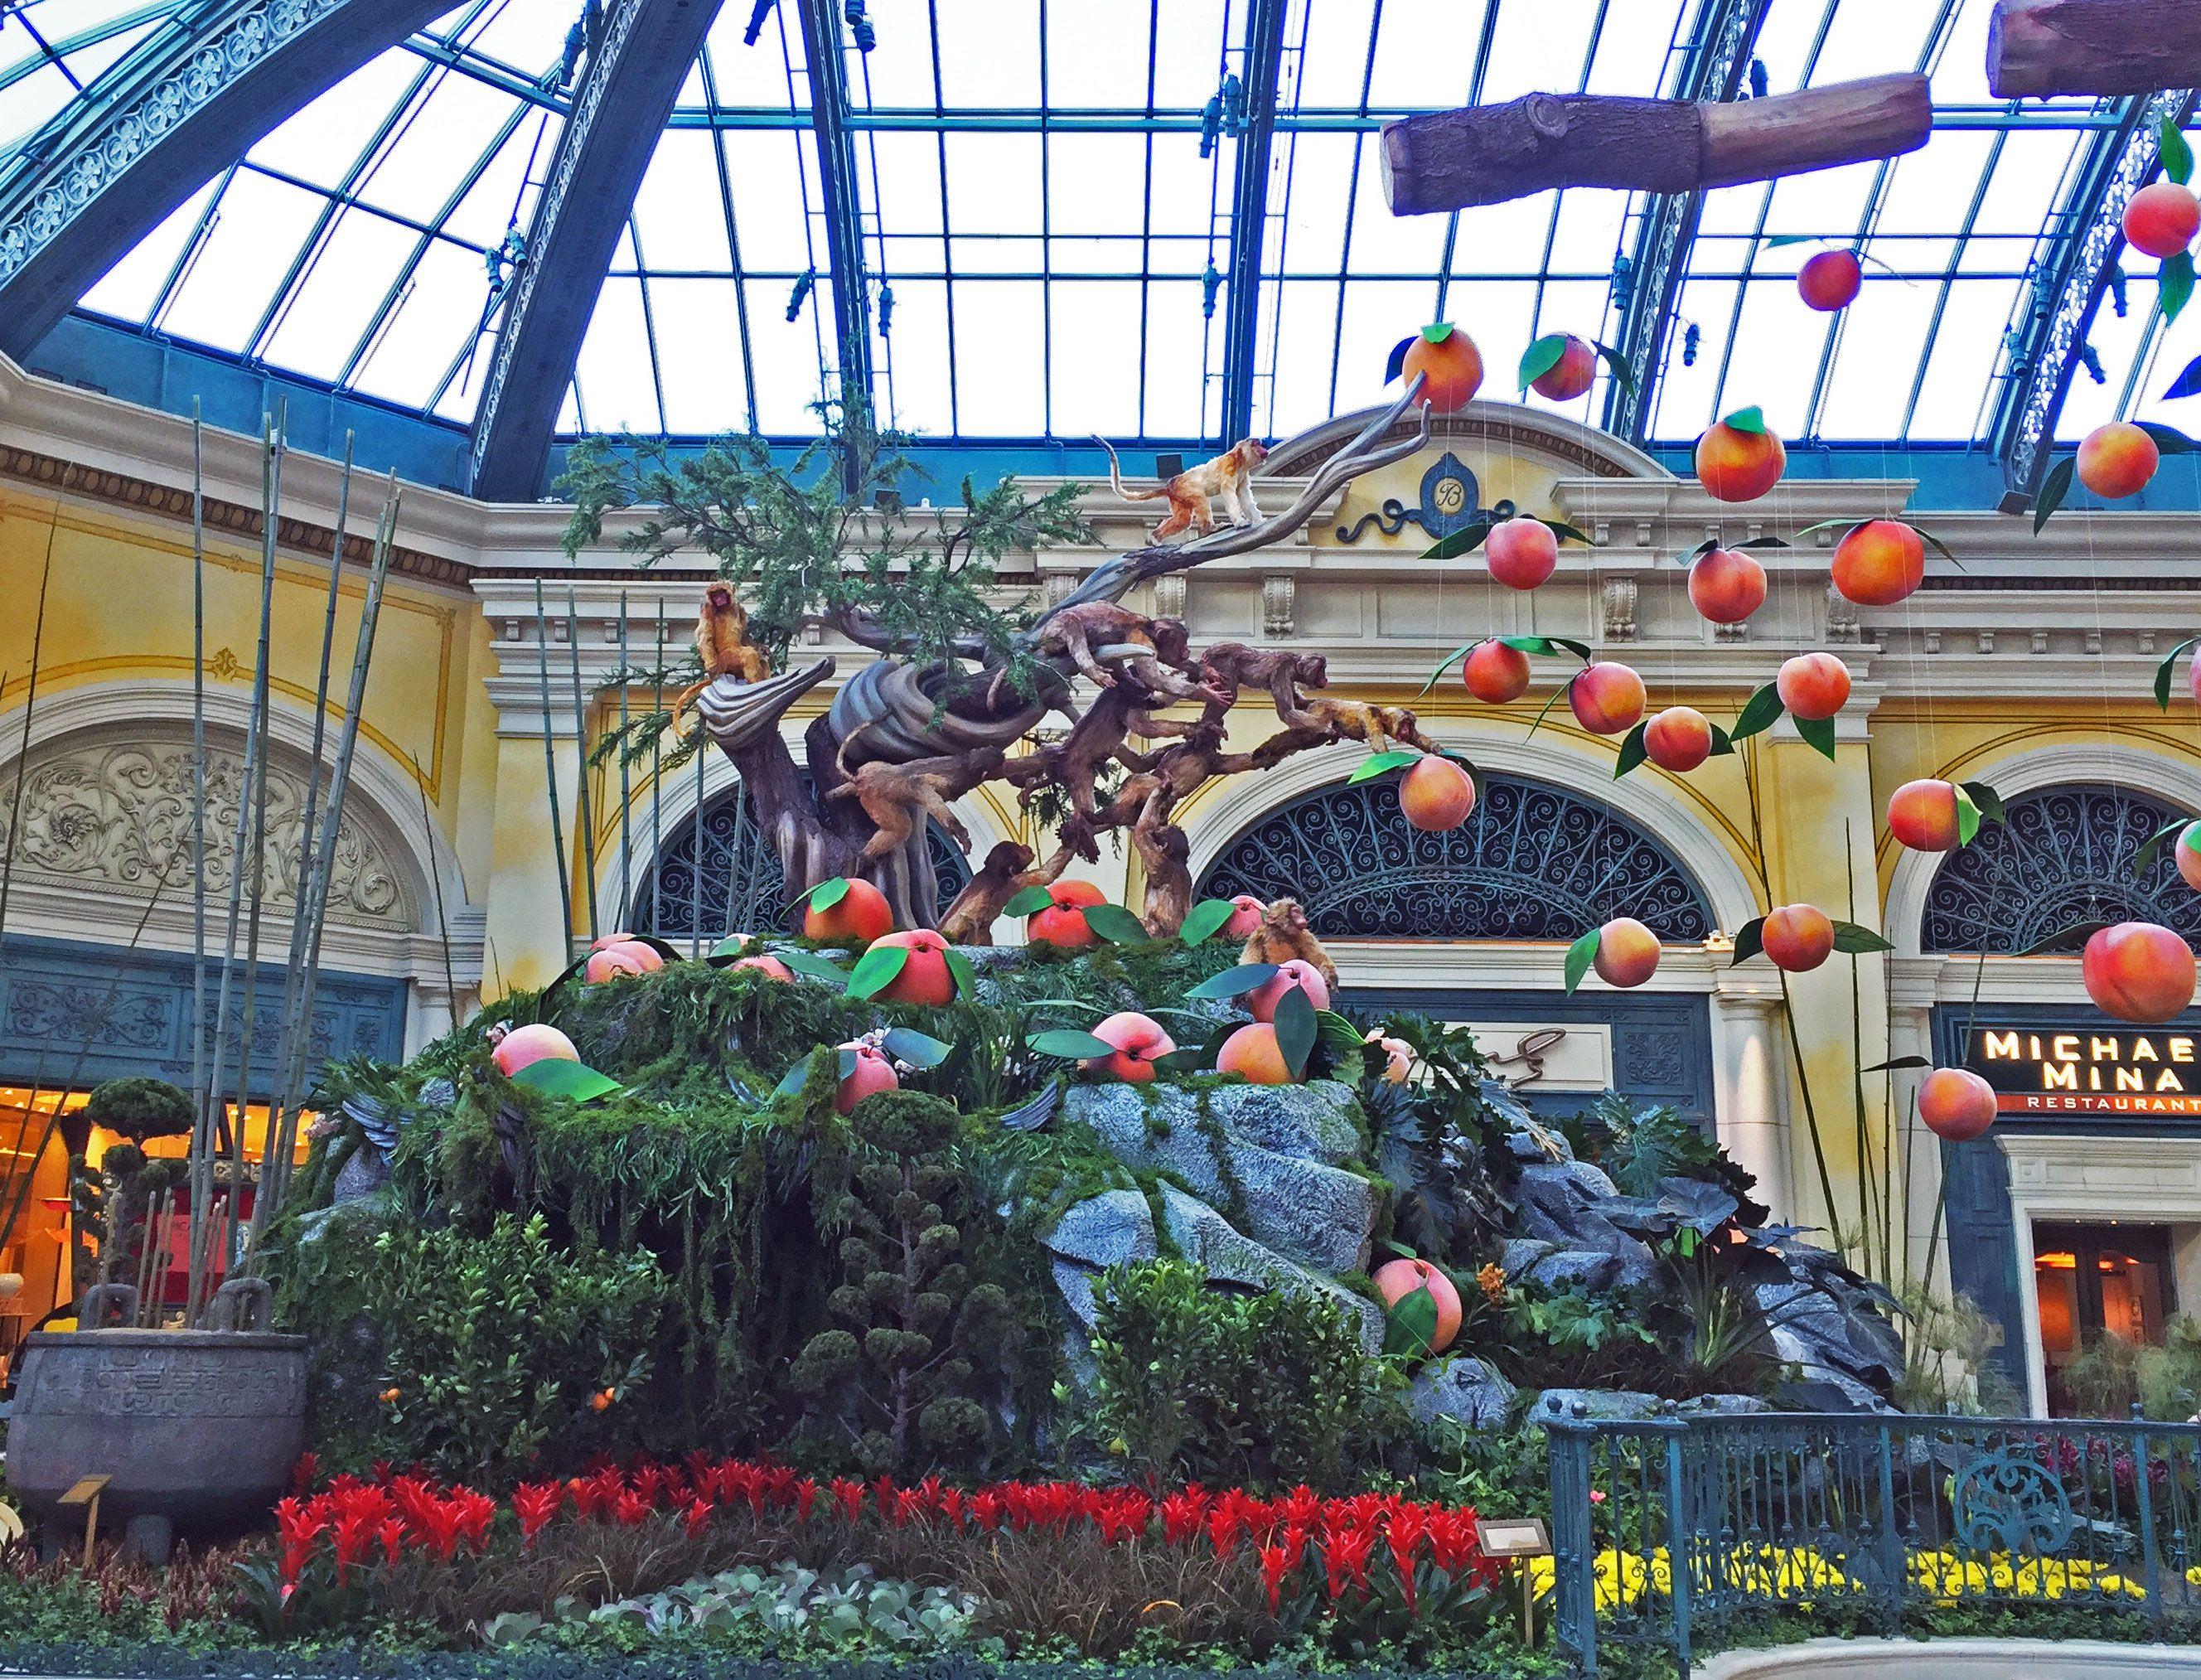 11560f7120fdb4a13a8a30c58e6b822a - Bellagio Conservatory & Botanical Gardens Las Vegas